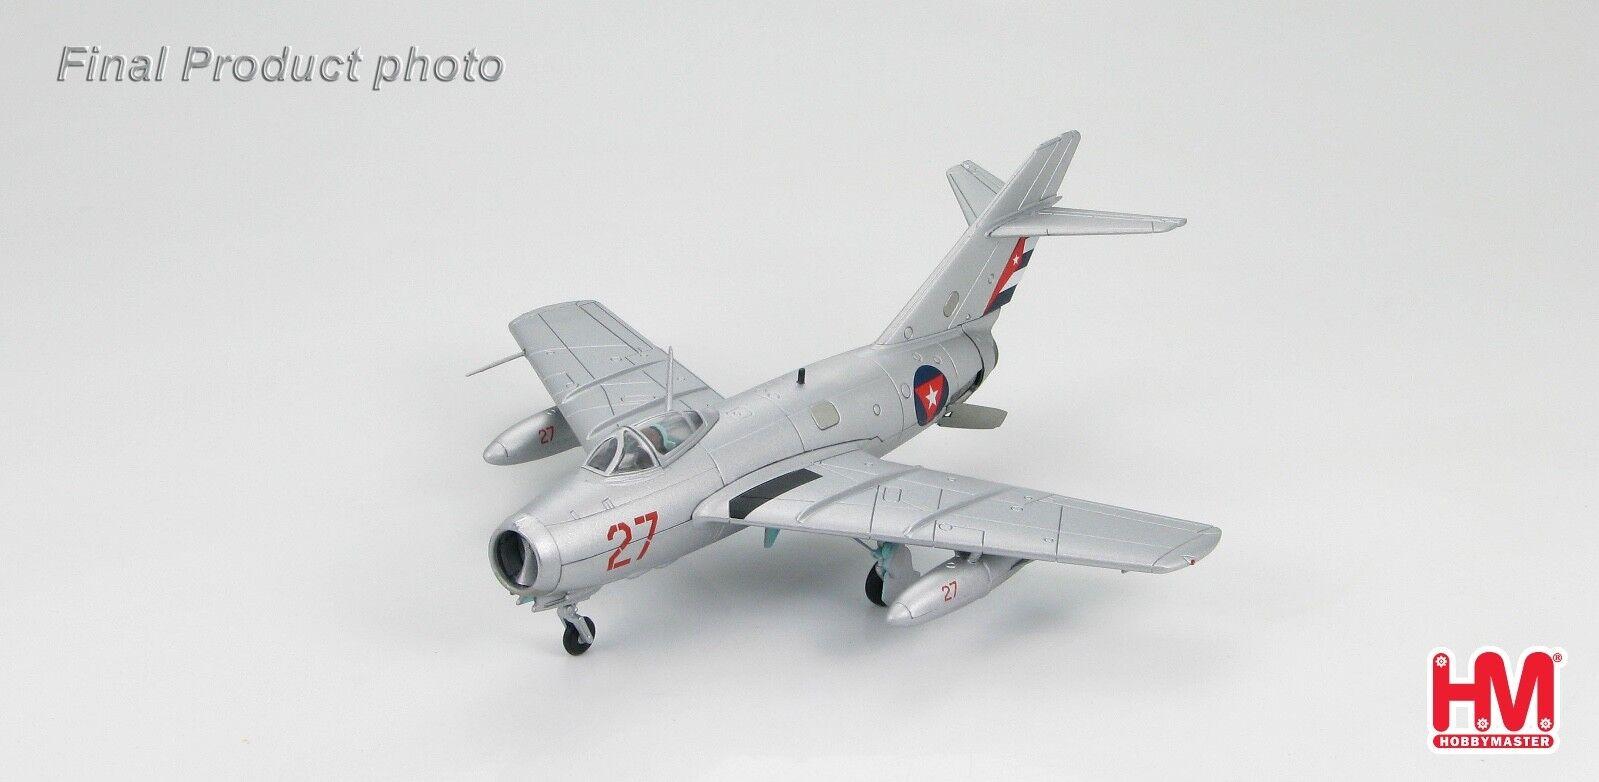 Hobby Master HA2413 1 72 MIG-15 bis  27  Cuba's Revolutionary Air Force